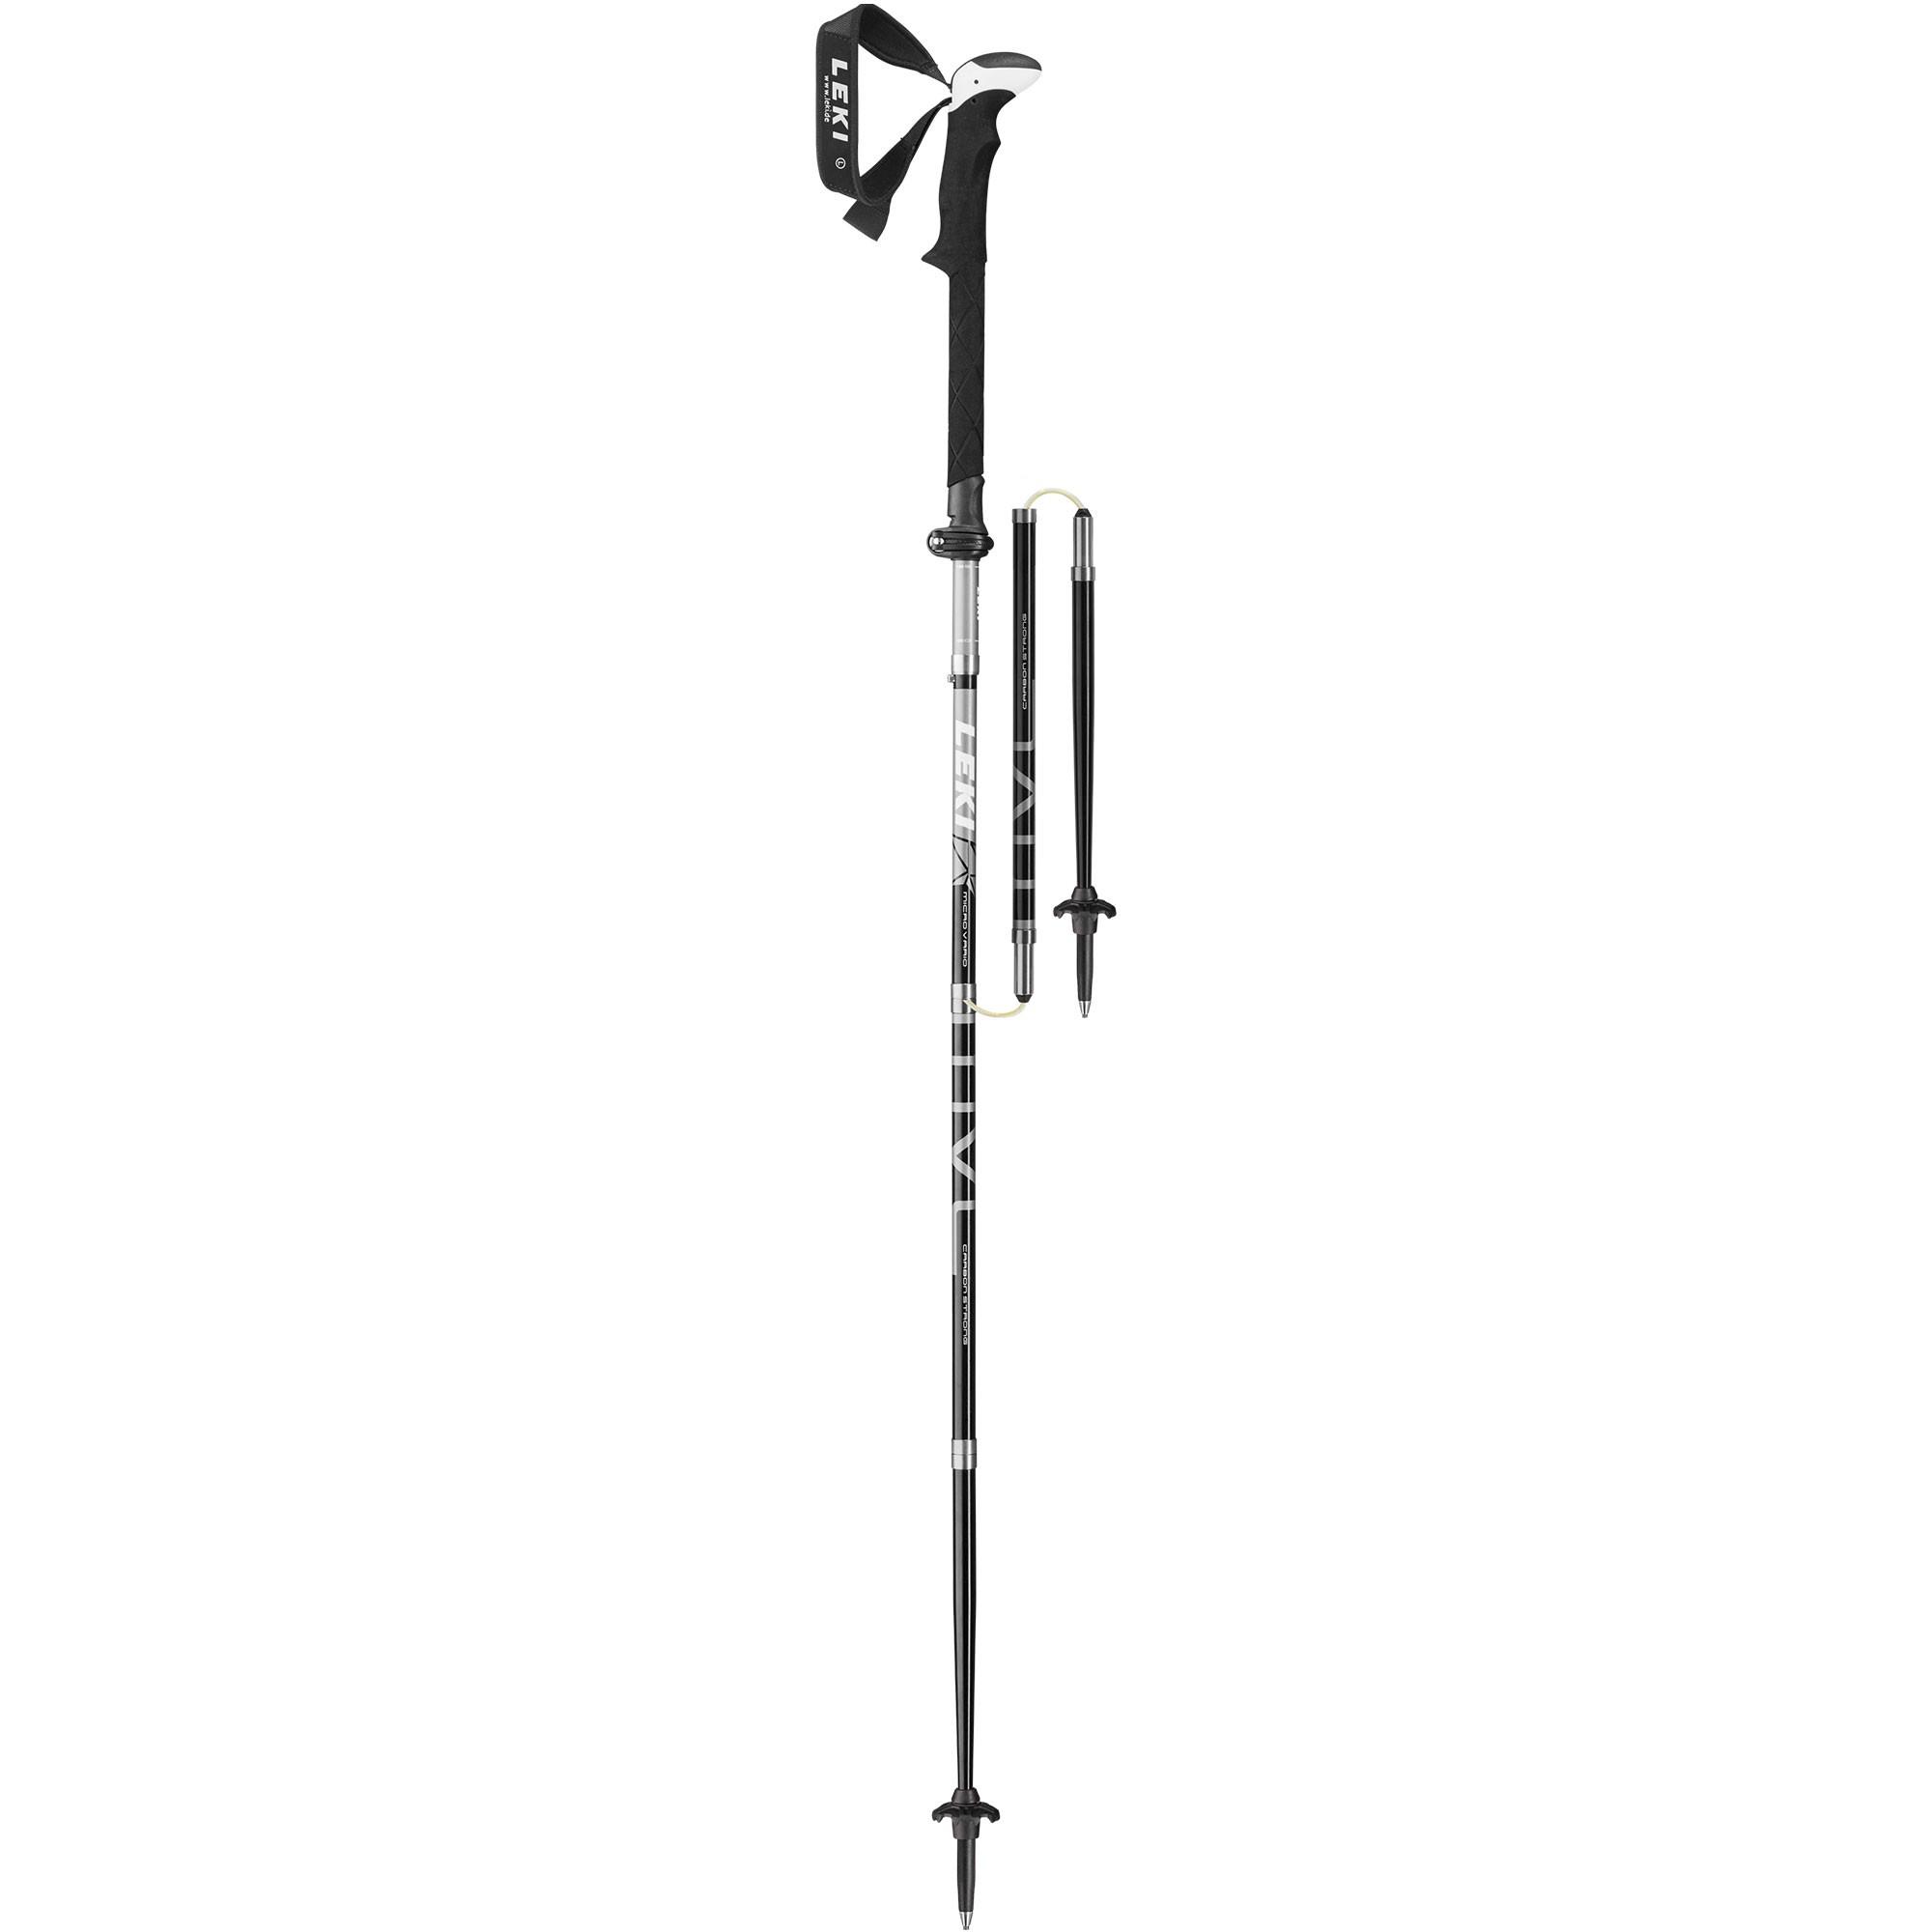 Leki Micro Vario Carbon Strong Trekking Poles